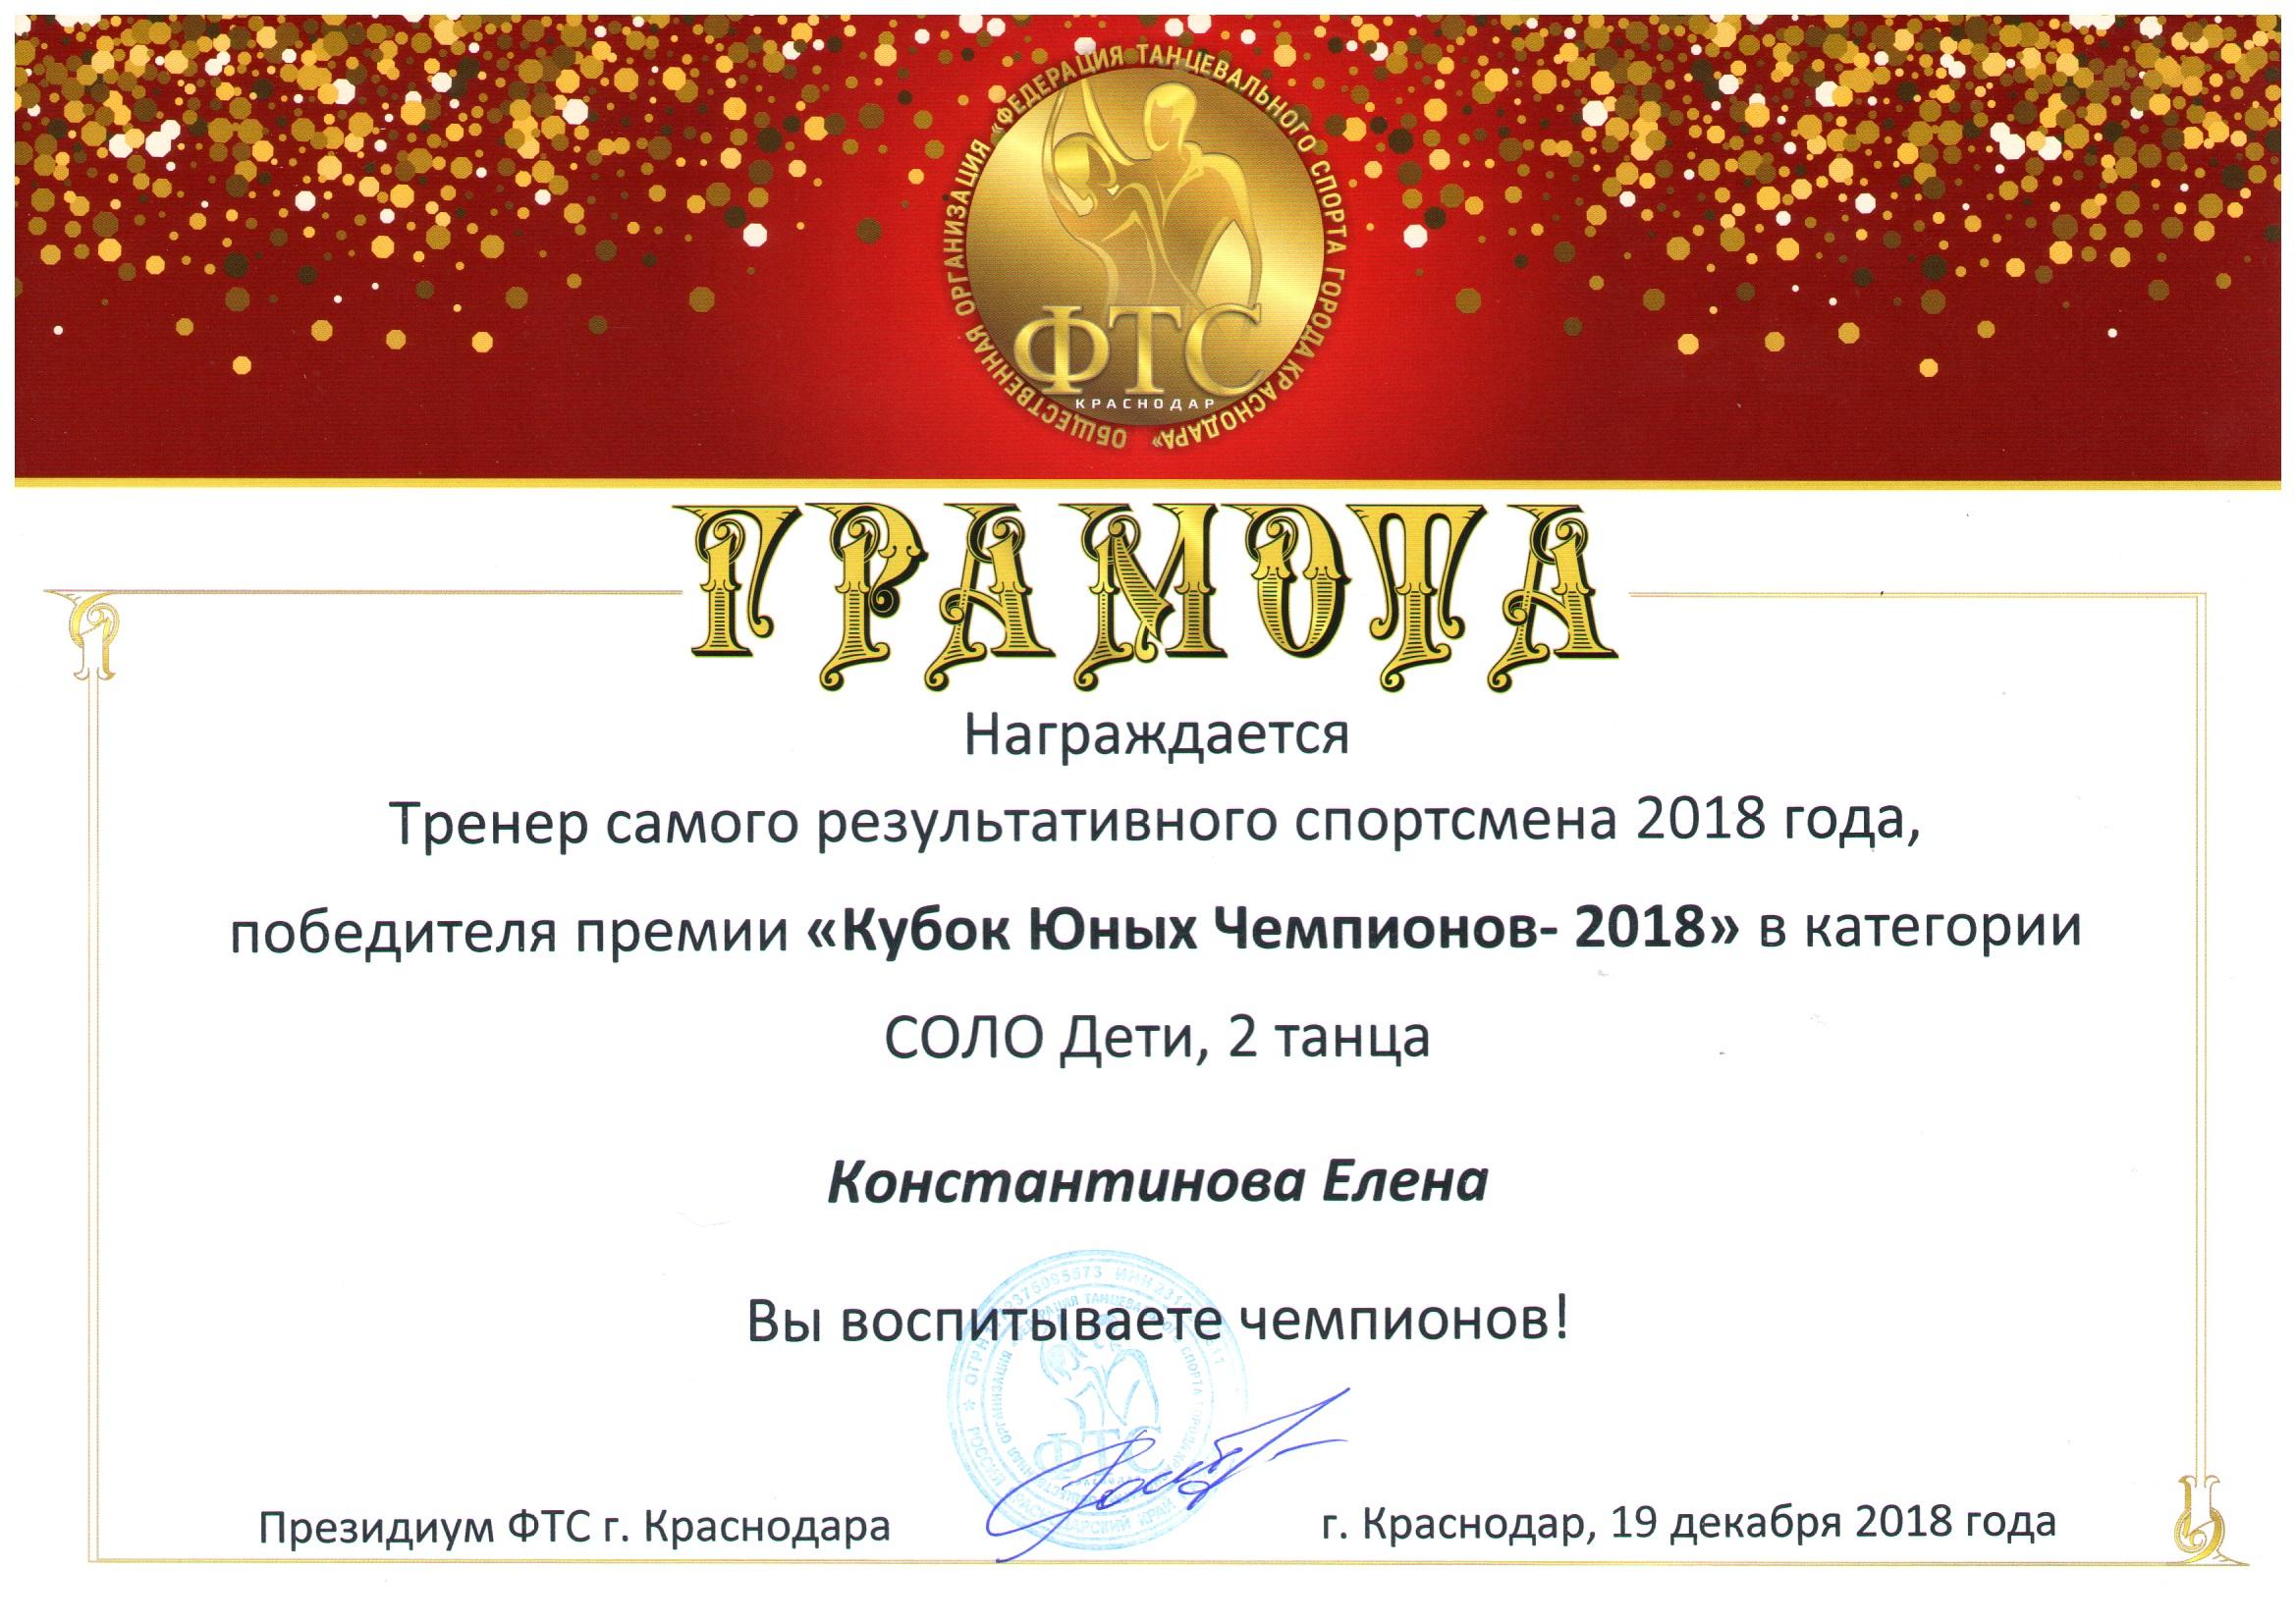 sertificate_14